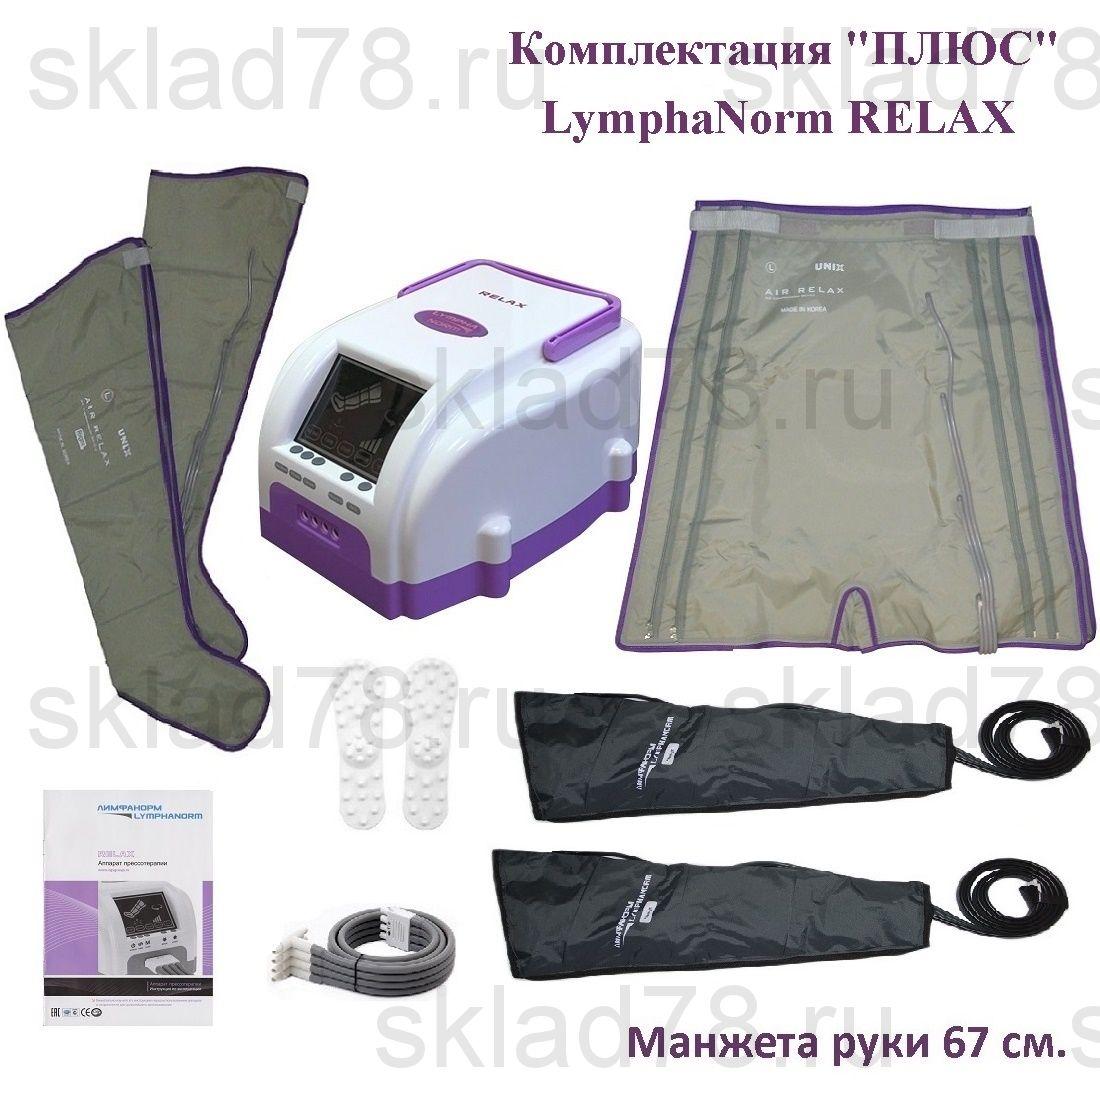 LymphaNorm RELAX Лимфодренаж «ПЛЮС» (руки 67 см.)